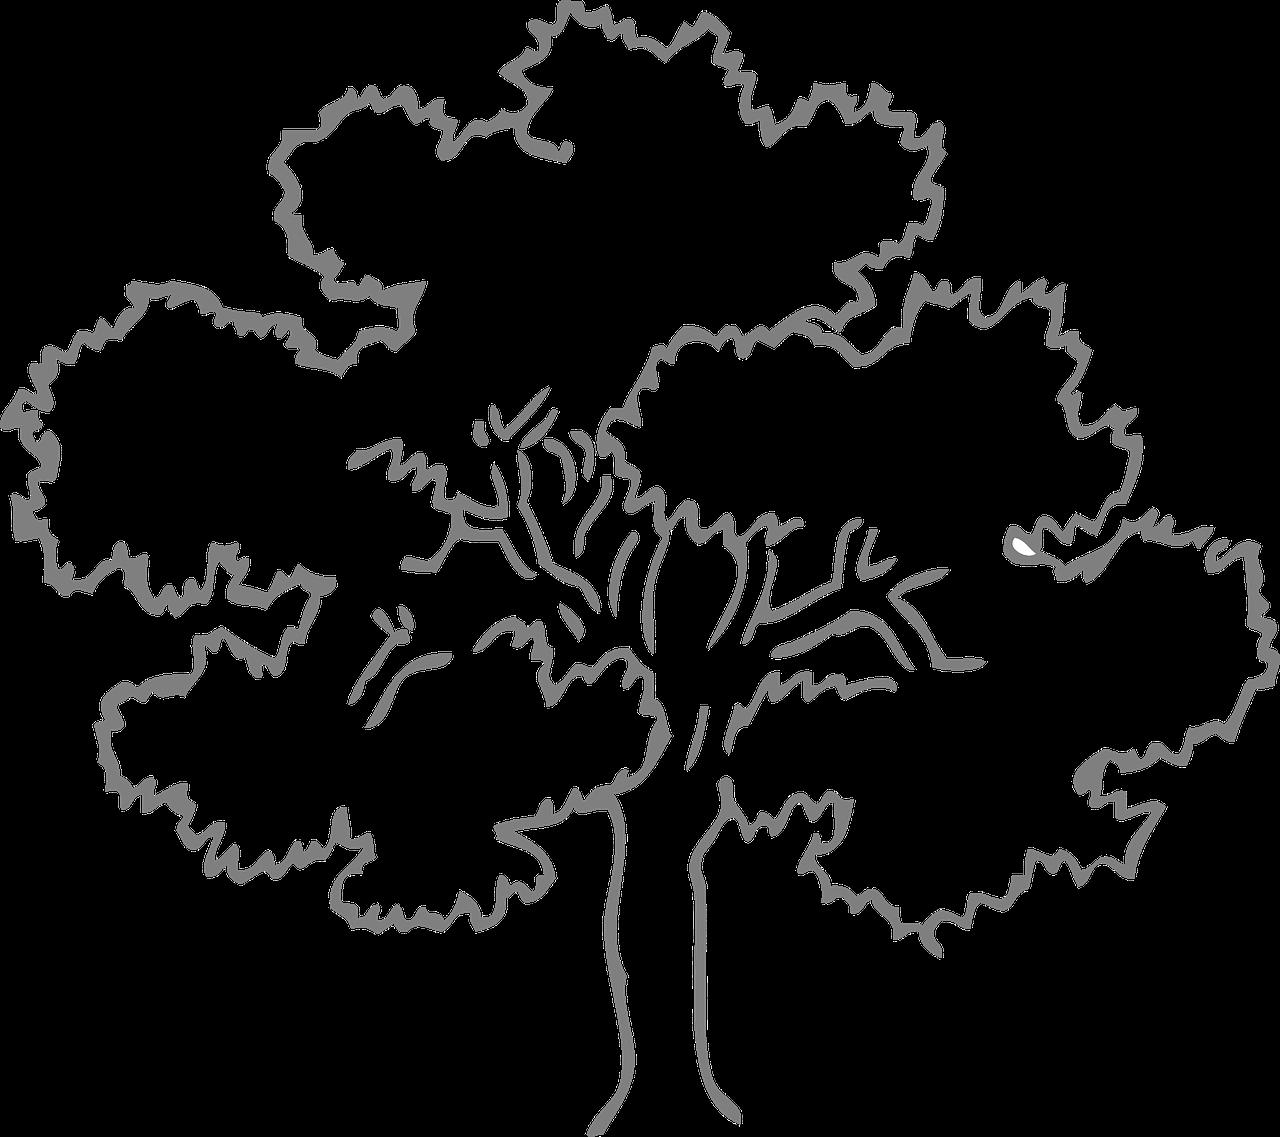 Red Oak Tree Stock Images RoyaltyFree Images amp Vectors